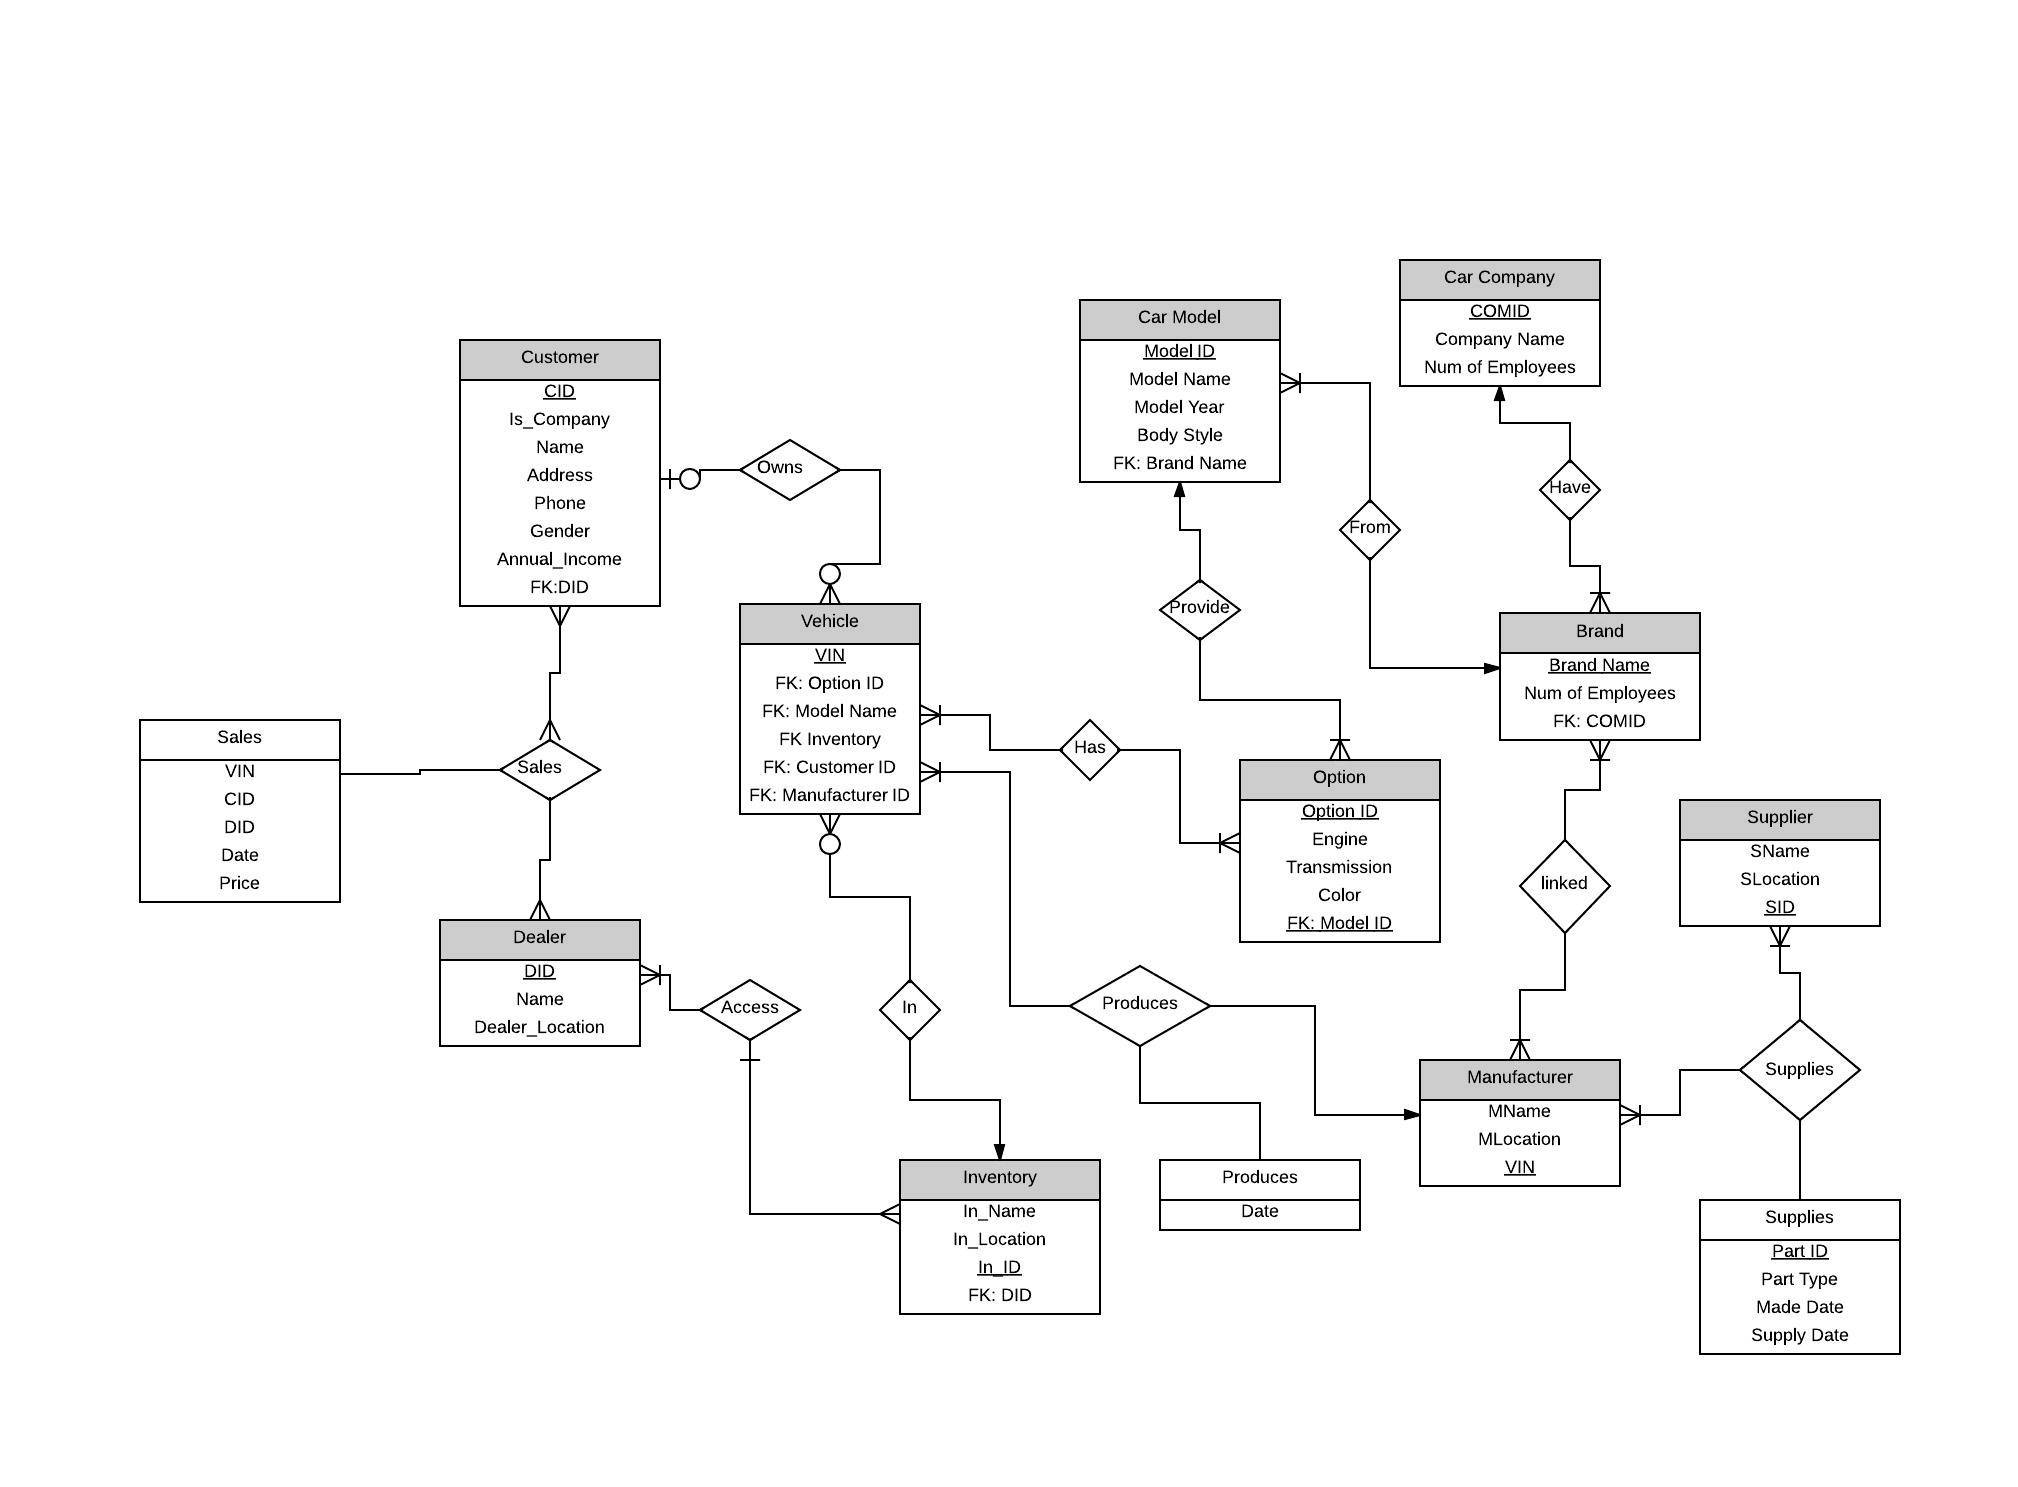 Er Diagram Car - 7.fearless-Wonder.de • throughout Examples Of Er Diagram For Car Company